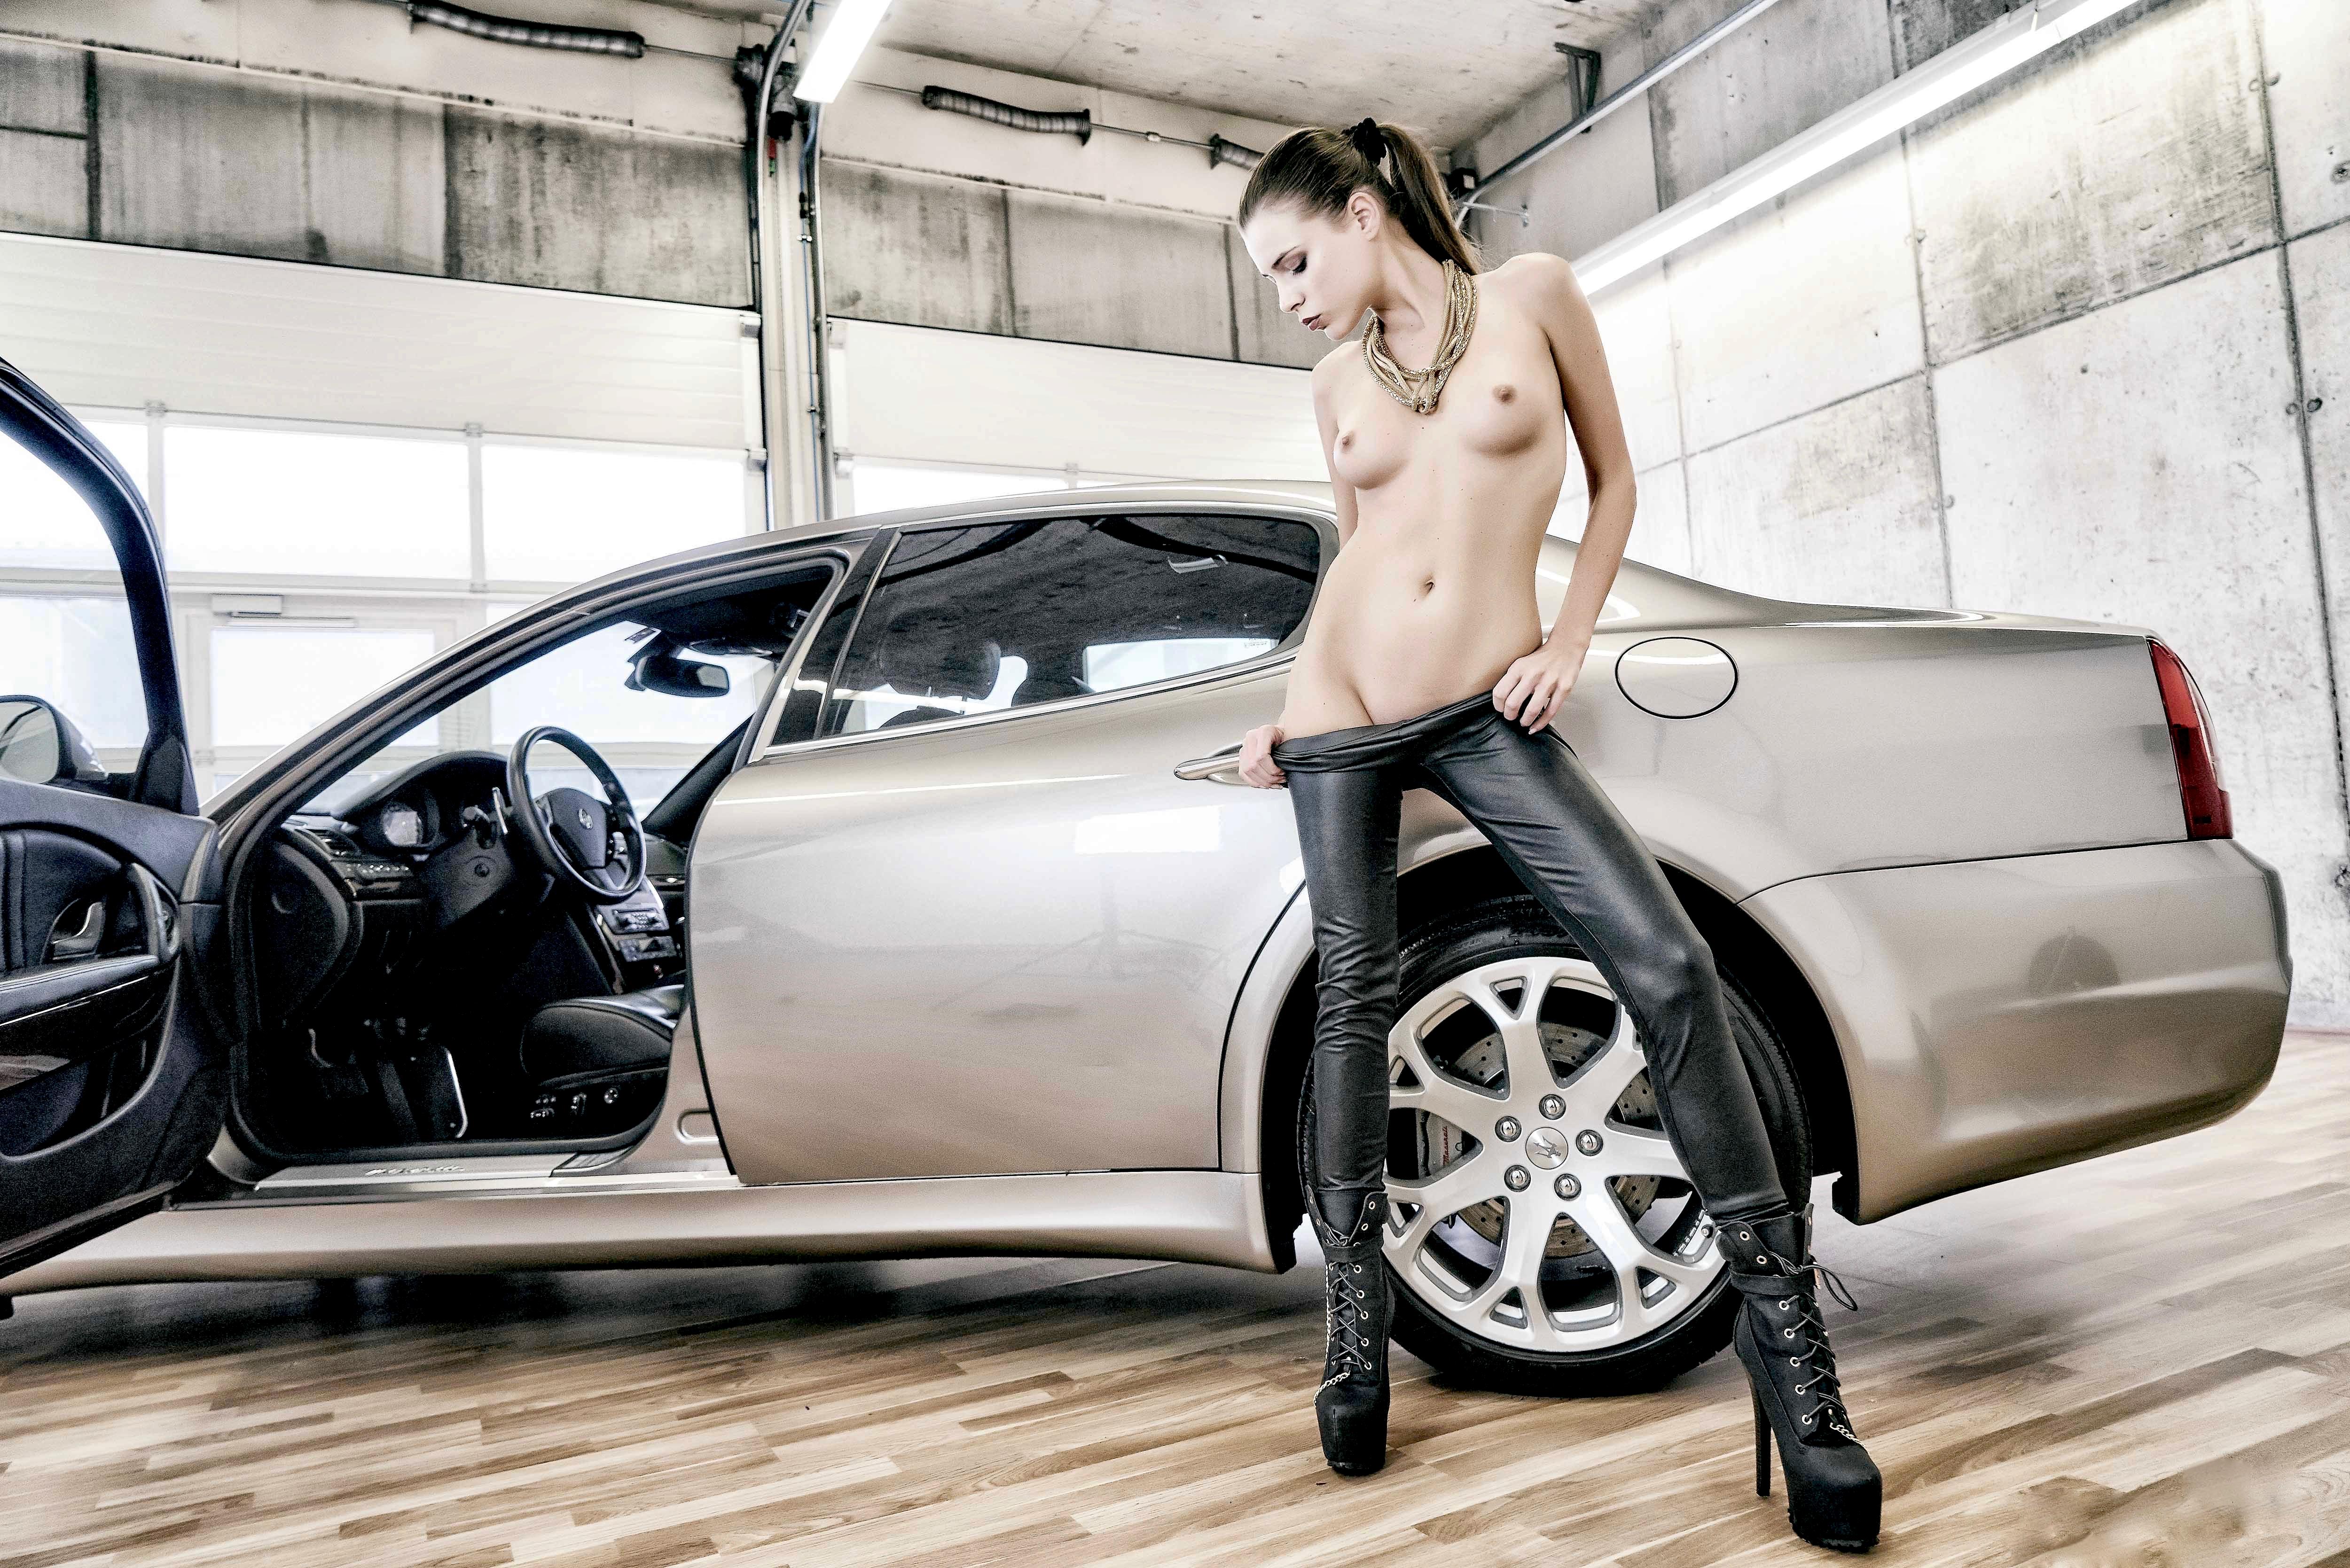 Perfect Tits Hard Nipples | Hot Girl HD Wallpaper